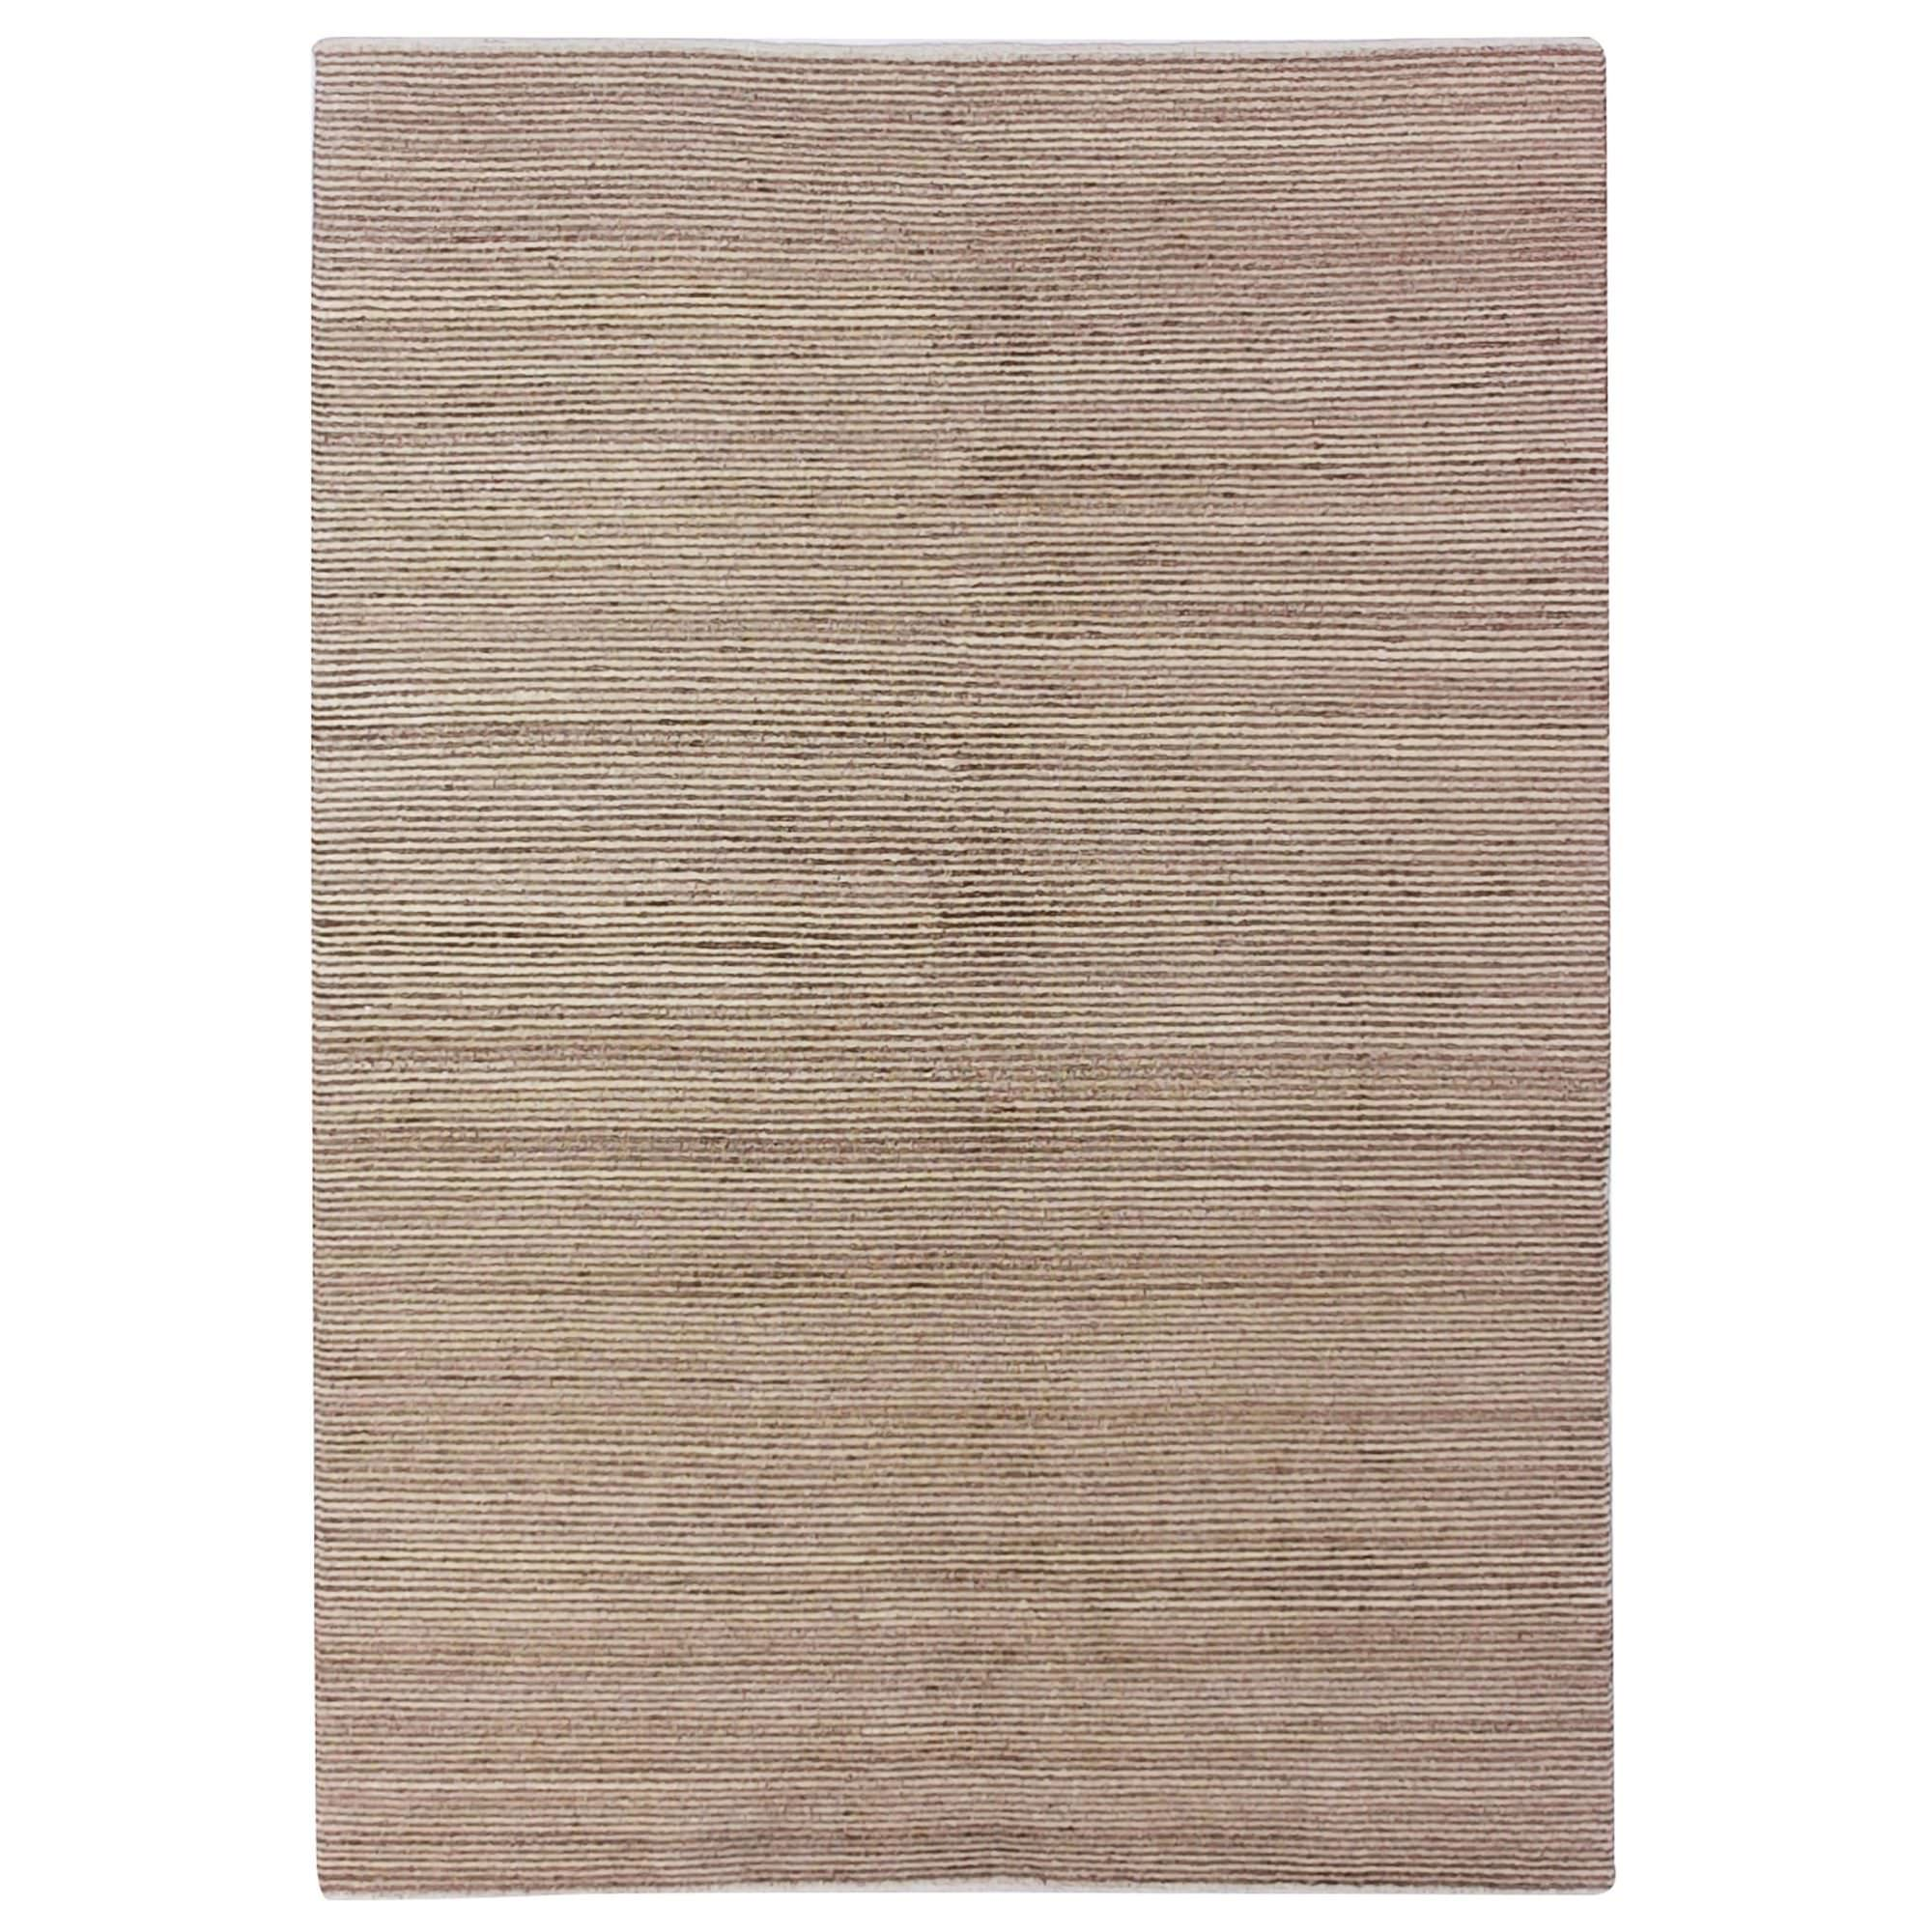 Boheme Hand Tufted Wool Rug, 300x400cm, Tan